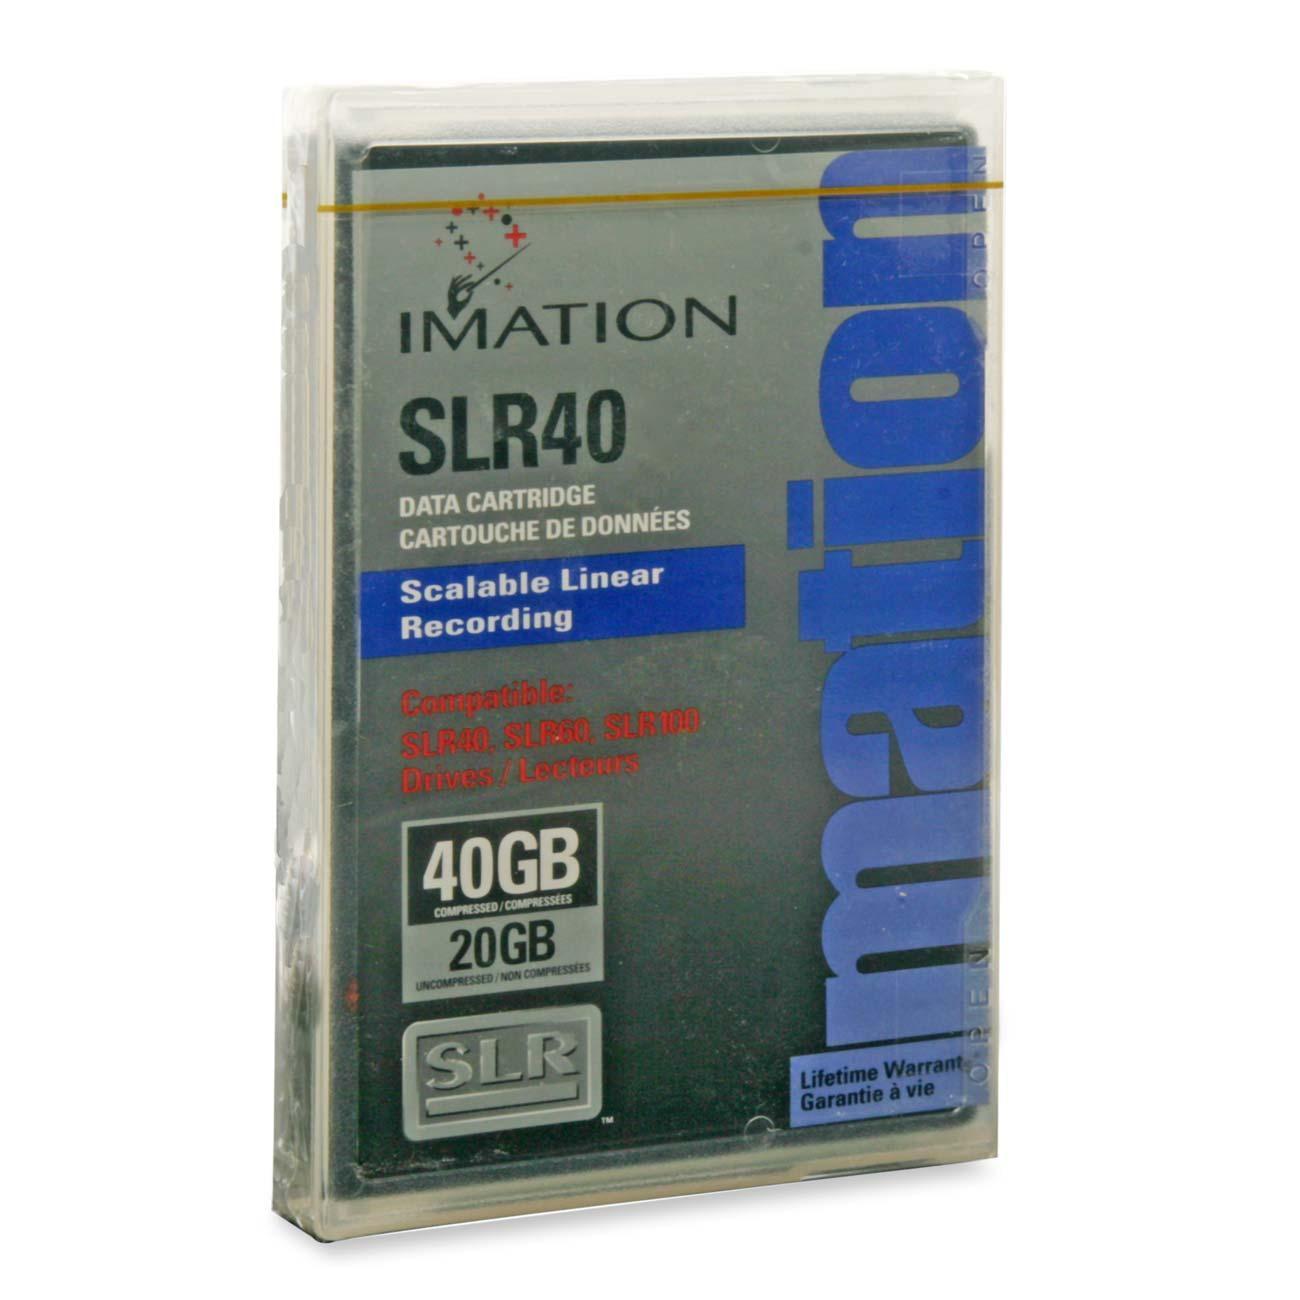 Imation Slr40 Tape Cartridge - Slrtape40 - 20 Gb [native] / 40 Gb [compressed] - 615 Ft Tape Length - 1 Pack (41112_34)